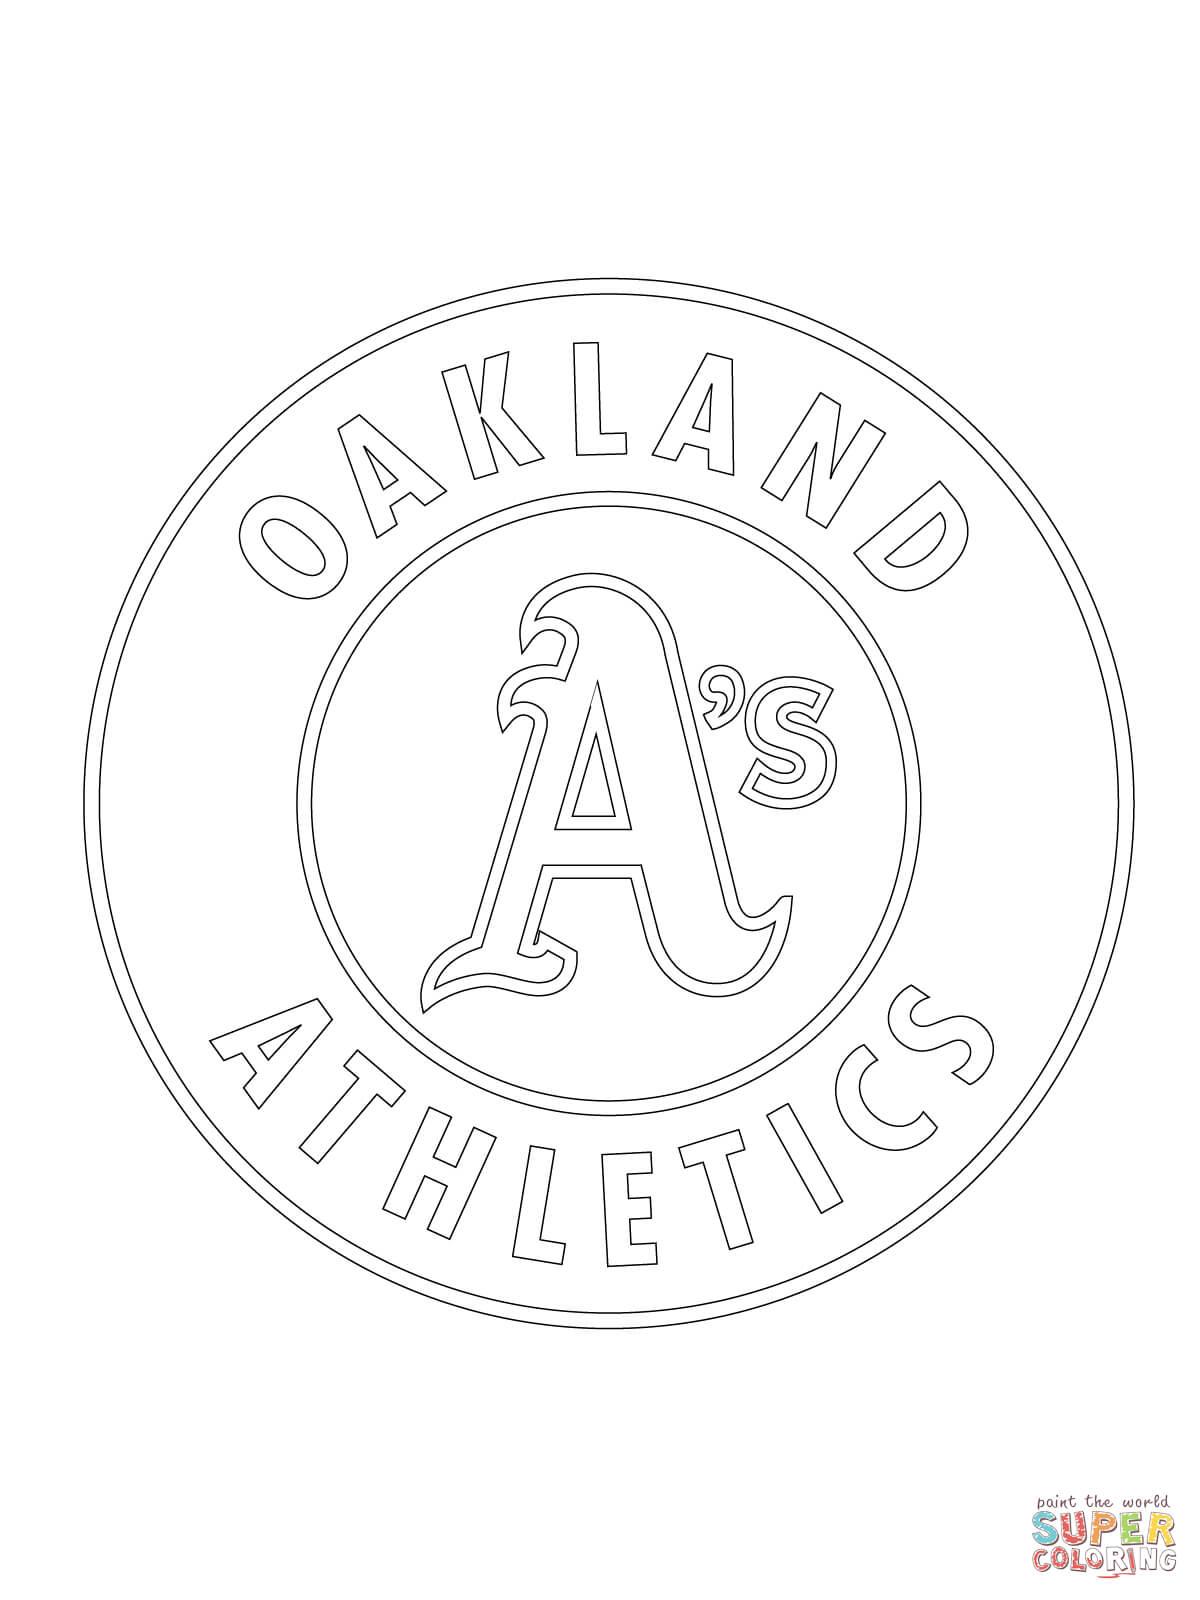 Oakland Athletics Logo Coloring Page